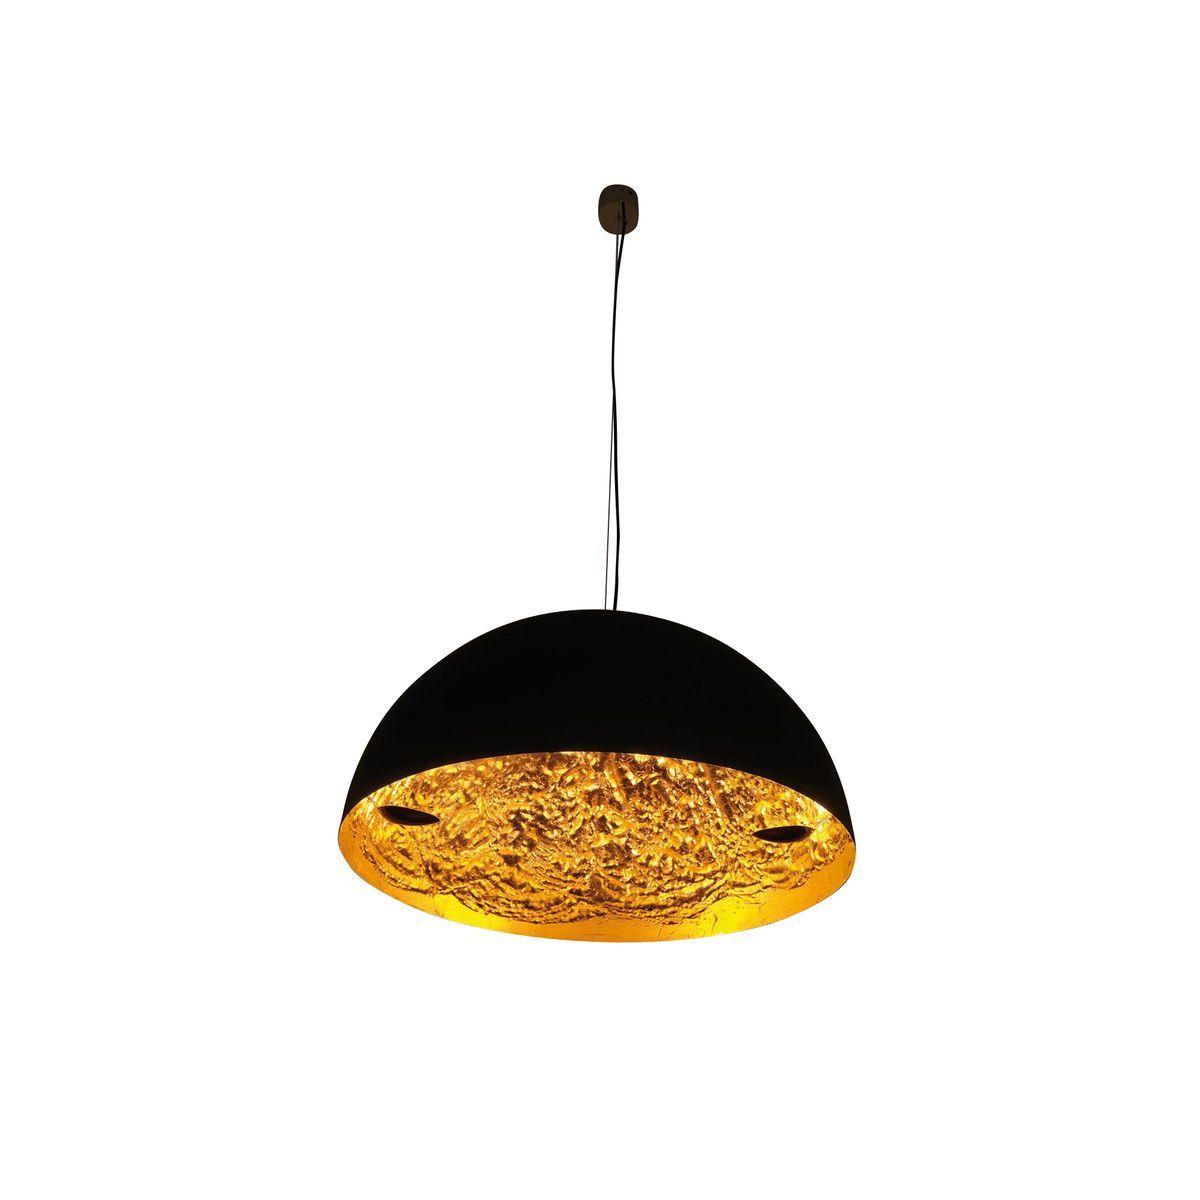 stchu moon 02 pendelleuchte 40 60 catellani smith. Black Bedroom Furniture Sets. Home Design Ideas